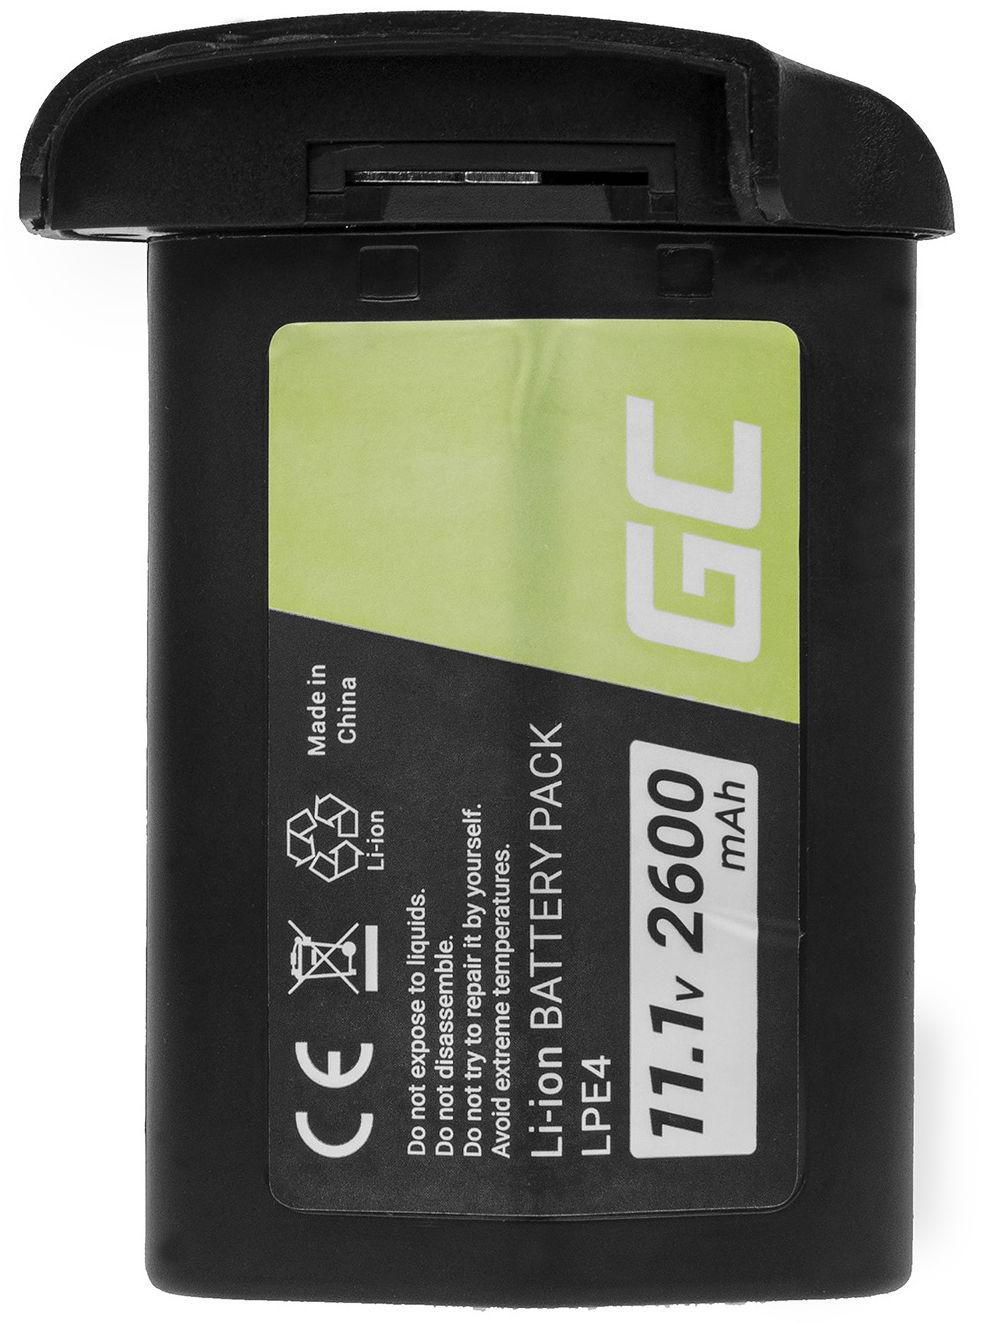 Akumulator Bateria Green Cell  LP-E4 LP-E4N LPE4N do Canon EOS 1D 1Ds 1D X 1D Mark III 1Ds Mark III 1D Mark IV 11.1V 2600mAh